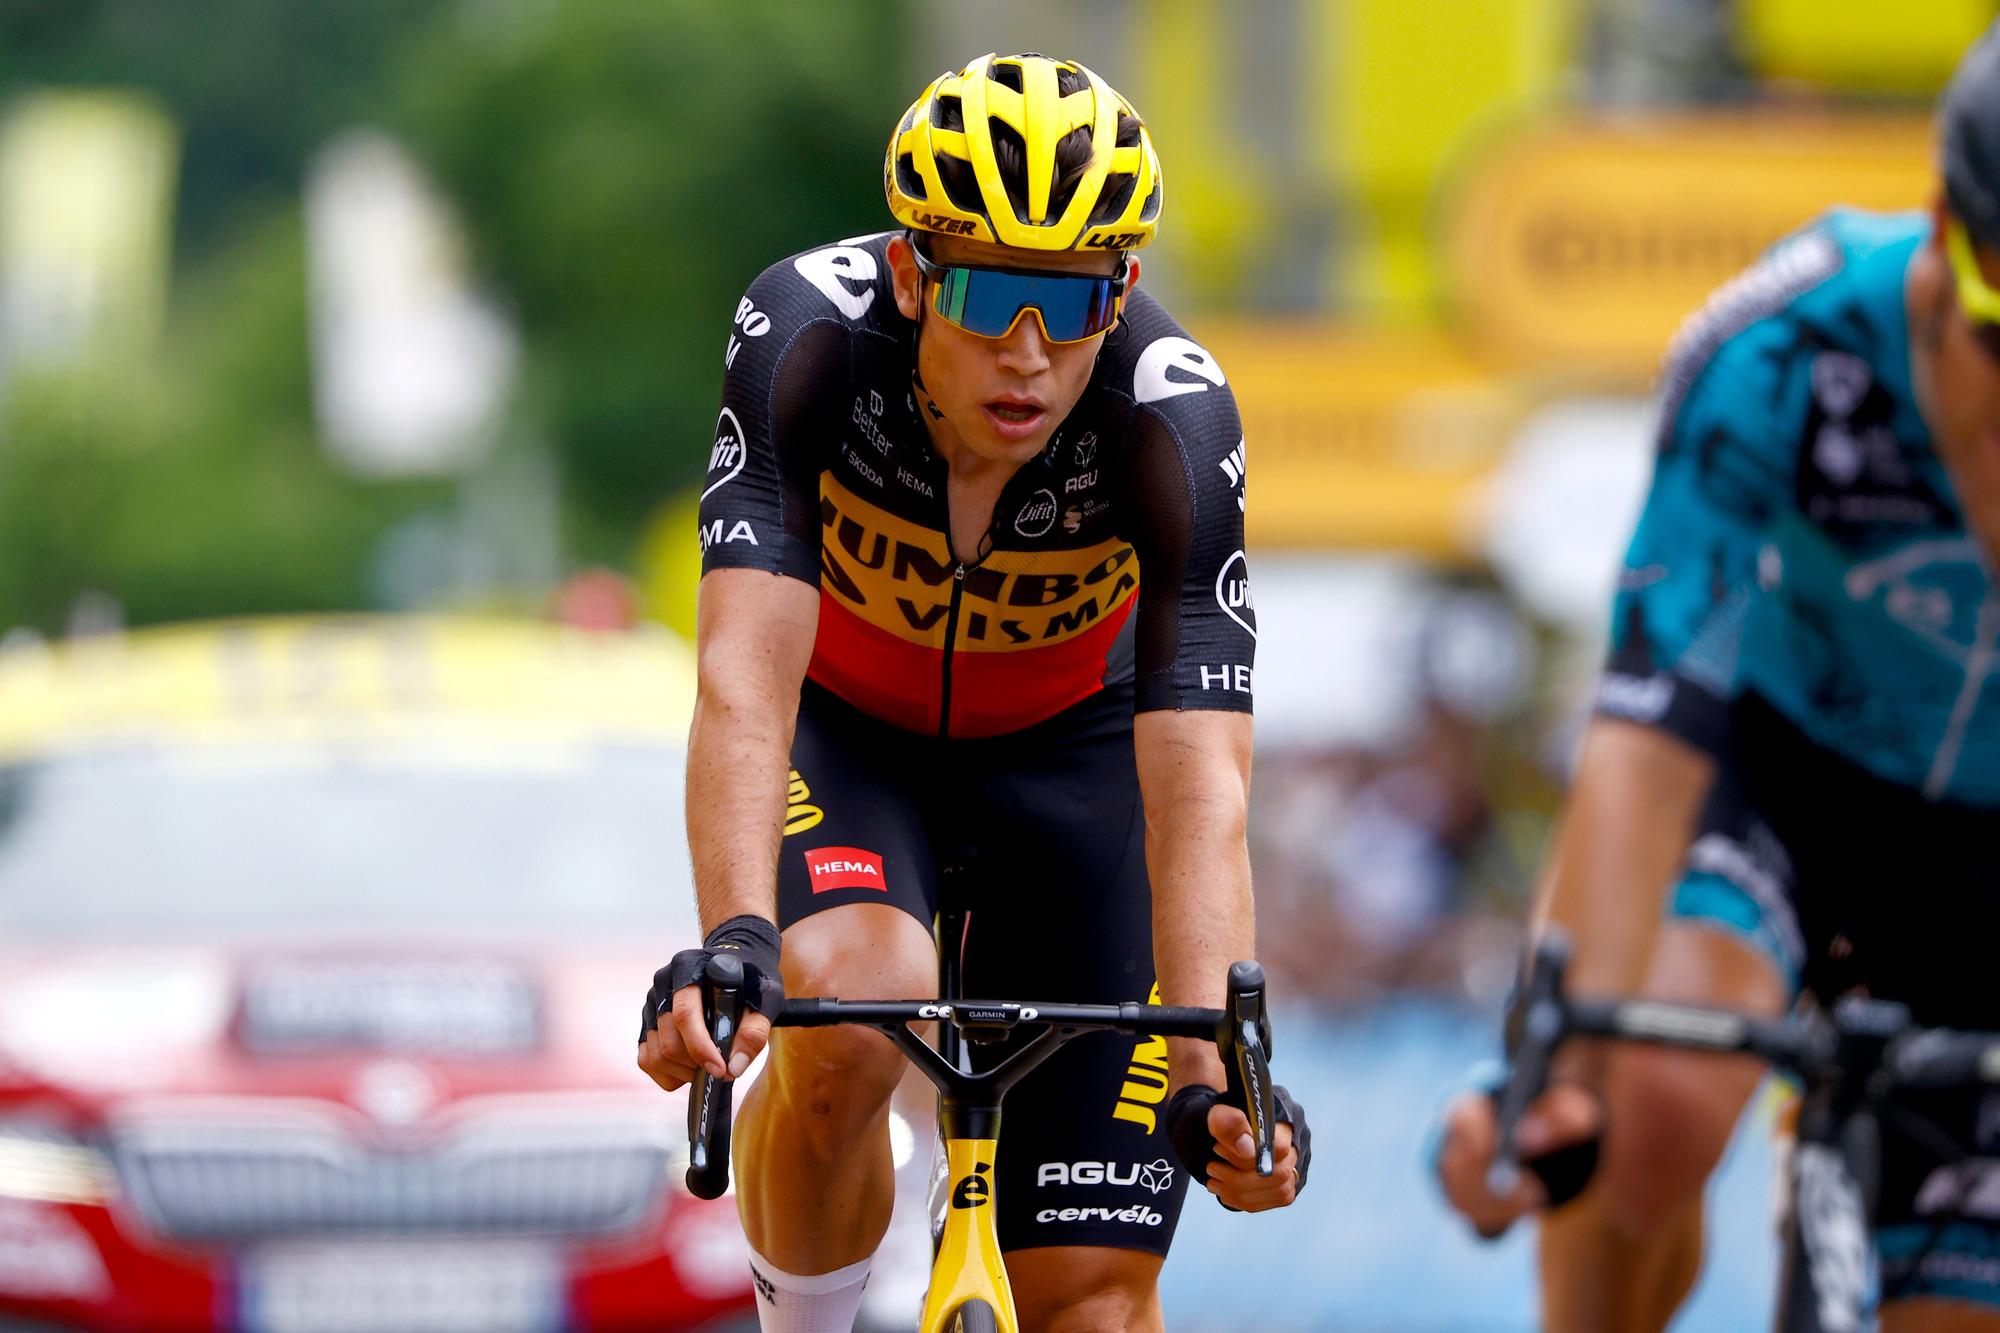 Tour de France 2021 108th Edition 7th stage Vierzon Le Creusot 2491 km 02072021 Wout Van Aert BEL Jumbo Visma photo Luca BettiniBettiniPhoto2021